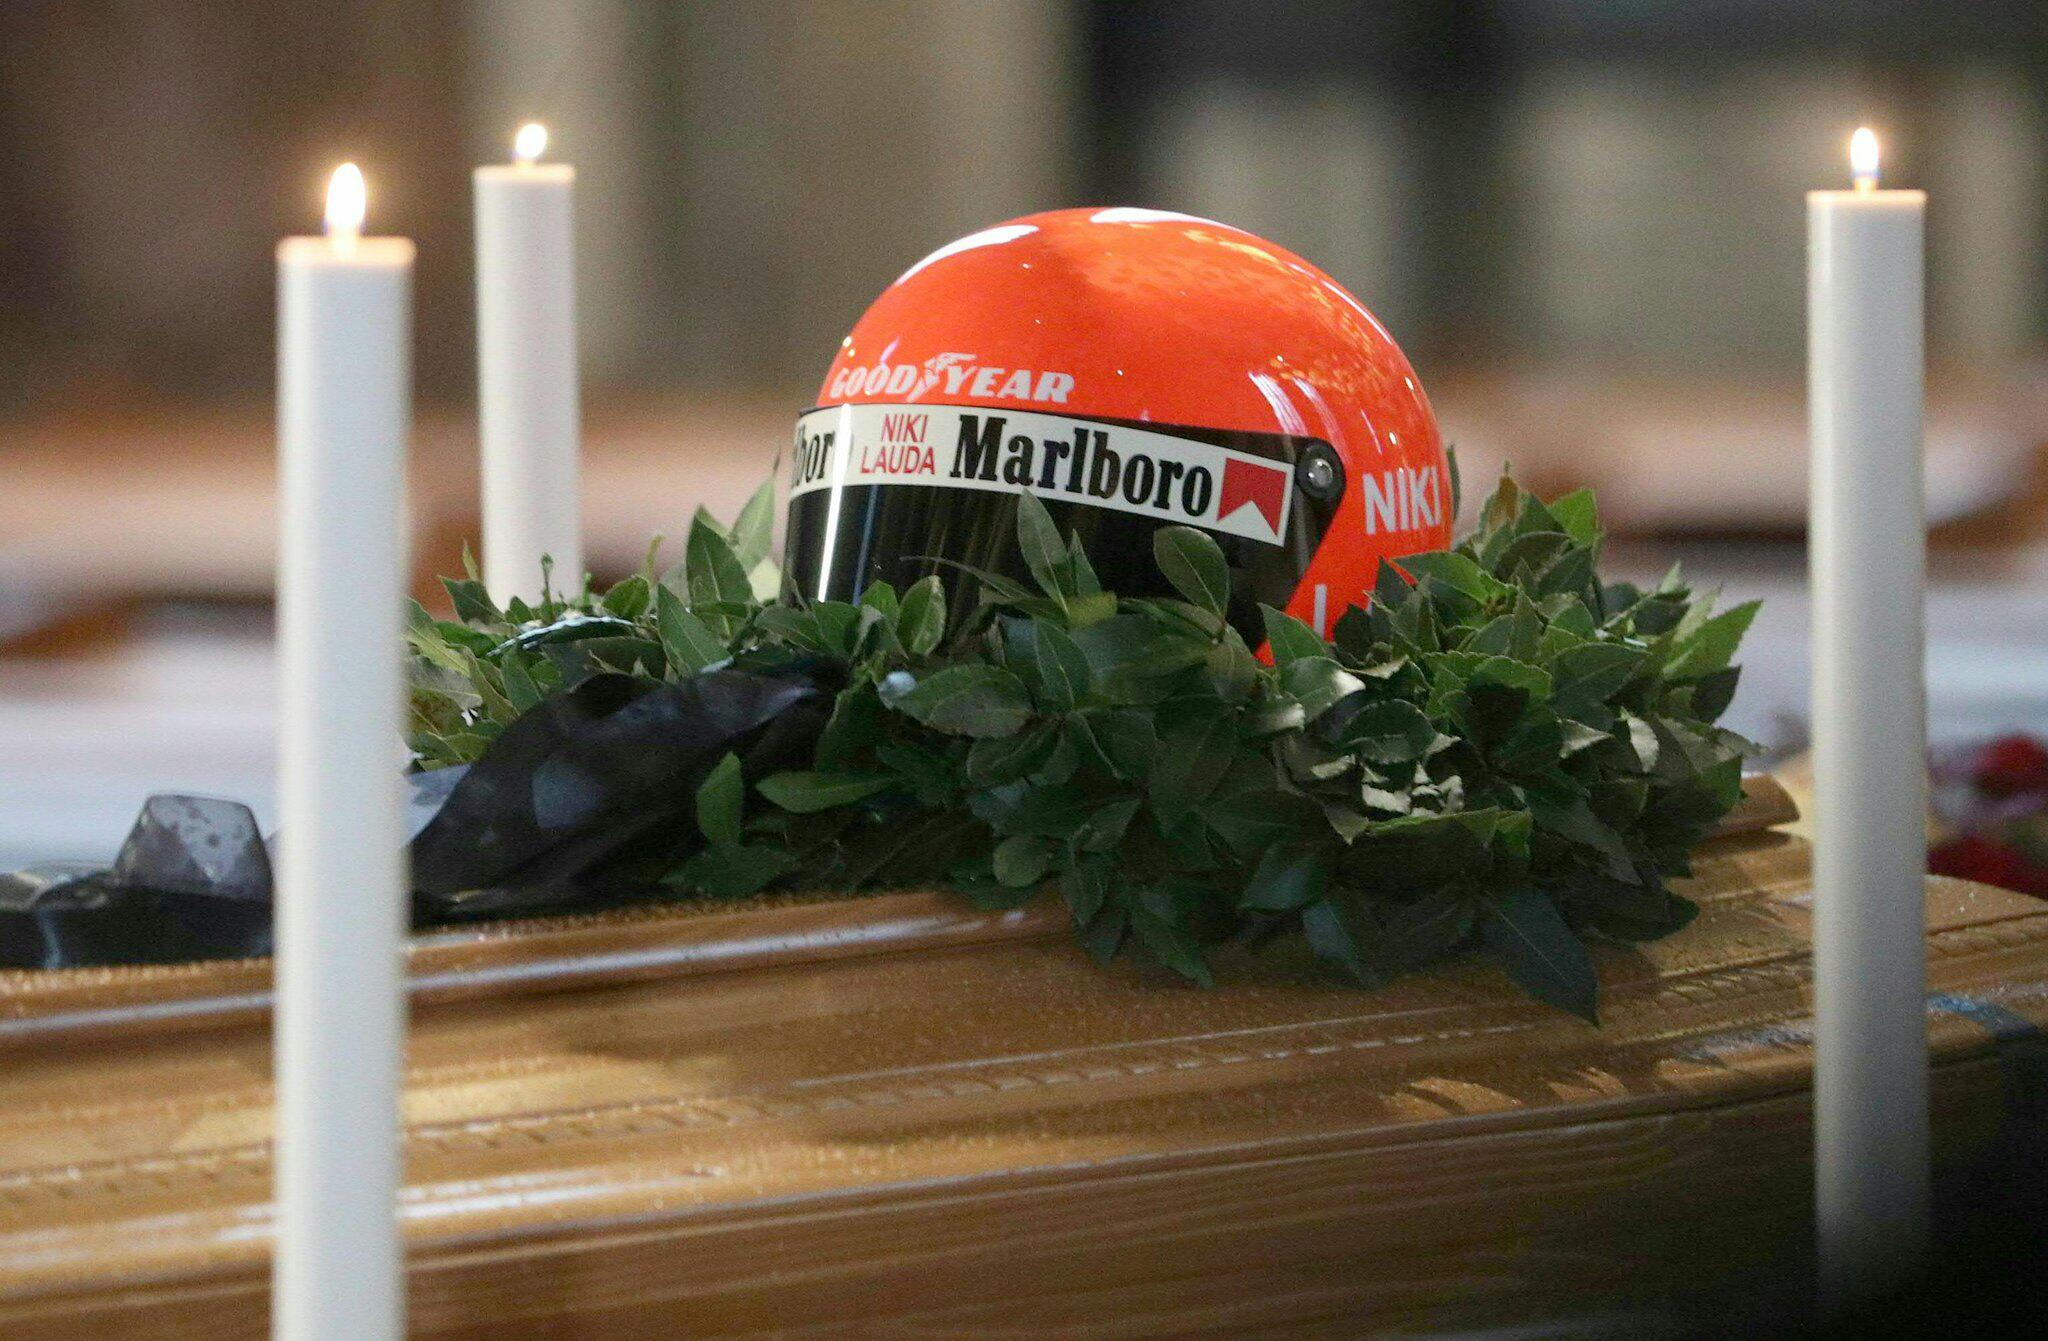 Bild zu Niki Lauda, Beerdigung, Trauerfeier